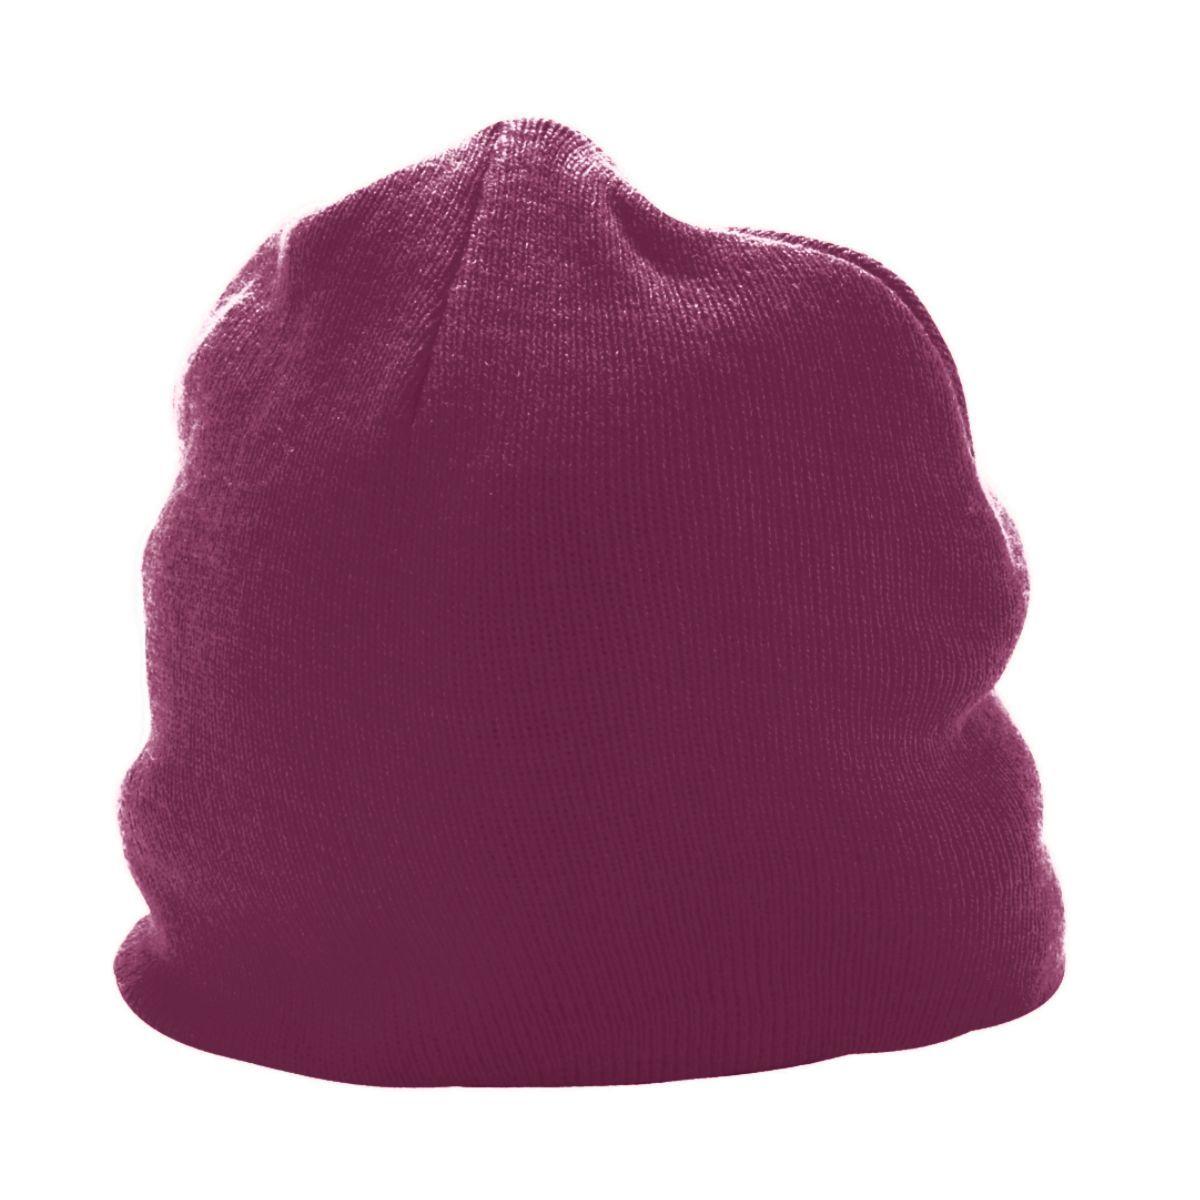 Knit Beanie - MAROON